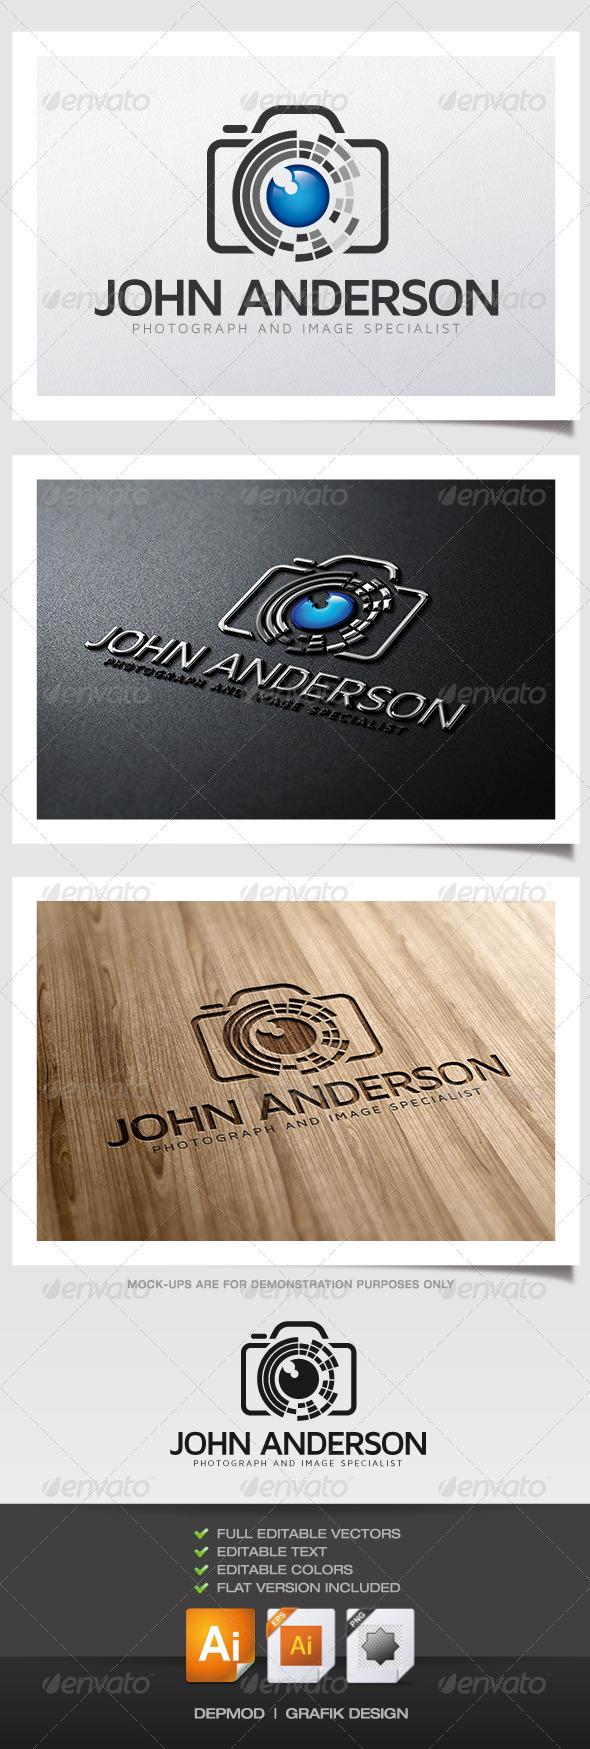 GraphicRiver John Anderson Logo photograph 5896161